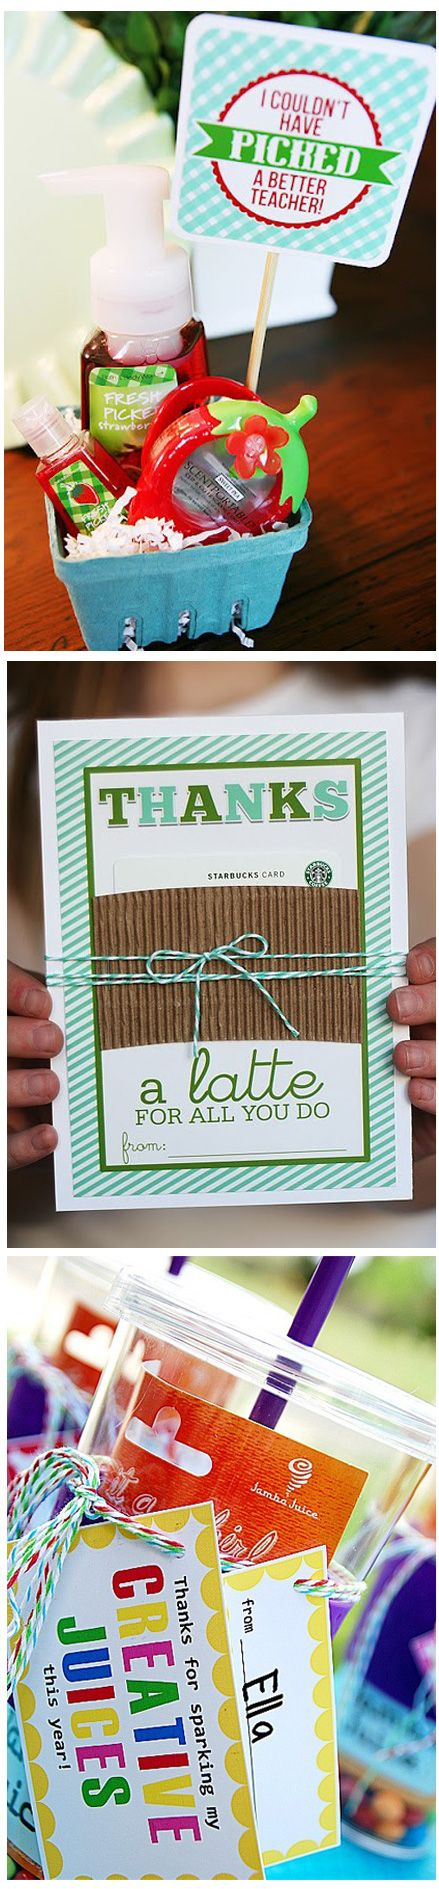 Teacher appreciation ideas :: 3 gifts for teacher appreciation day: Teacher Gifts, Teacher Appreciation, Gift Ideas, Gifts Card, Appreciation Gifts, Gift Cards, Card Holders, Thanks A Latte, Gifts Idea